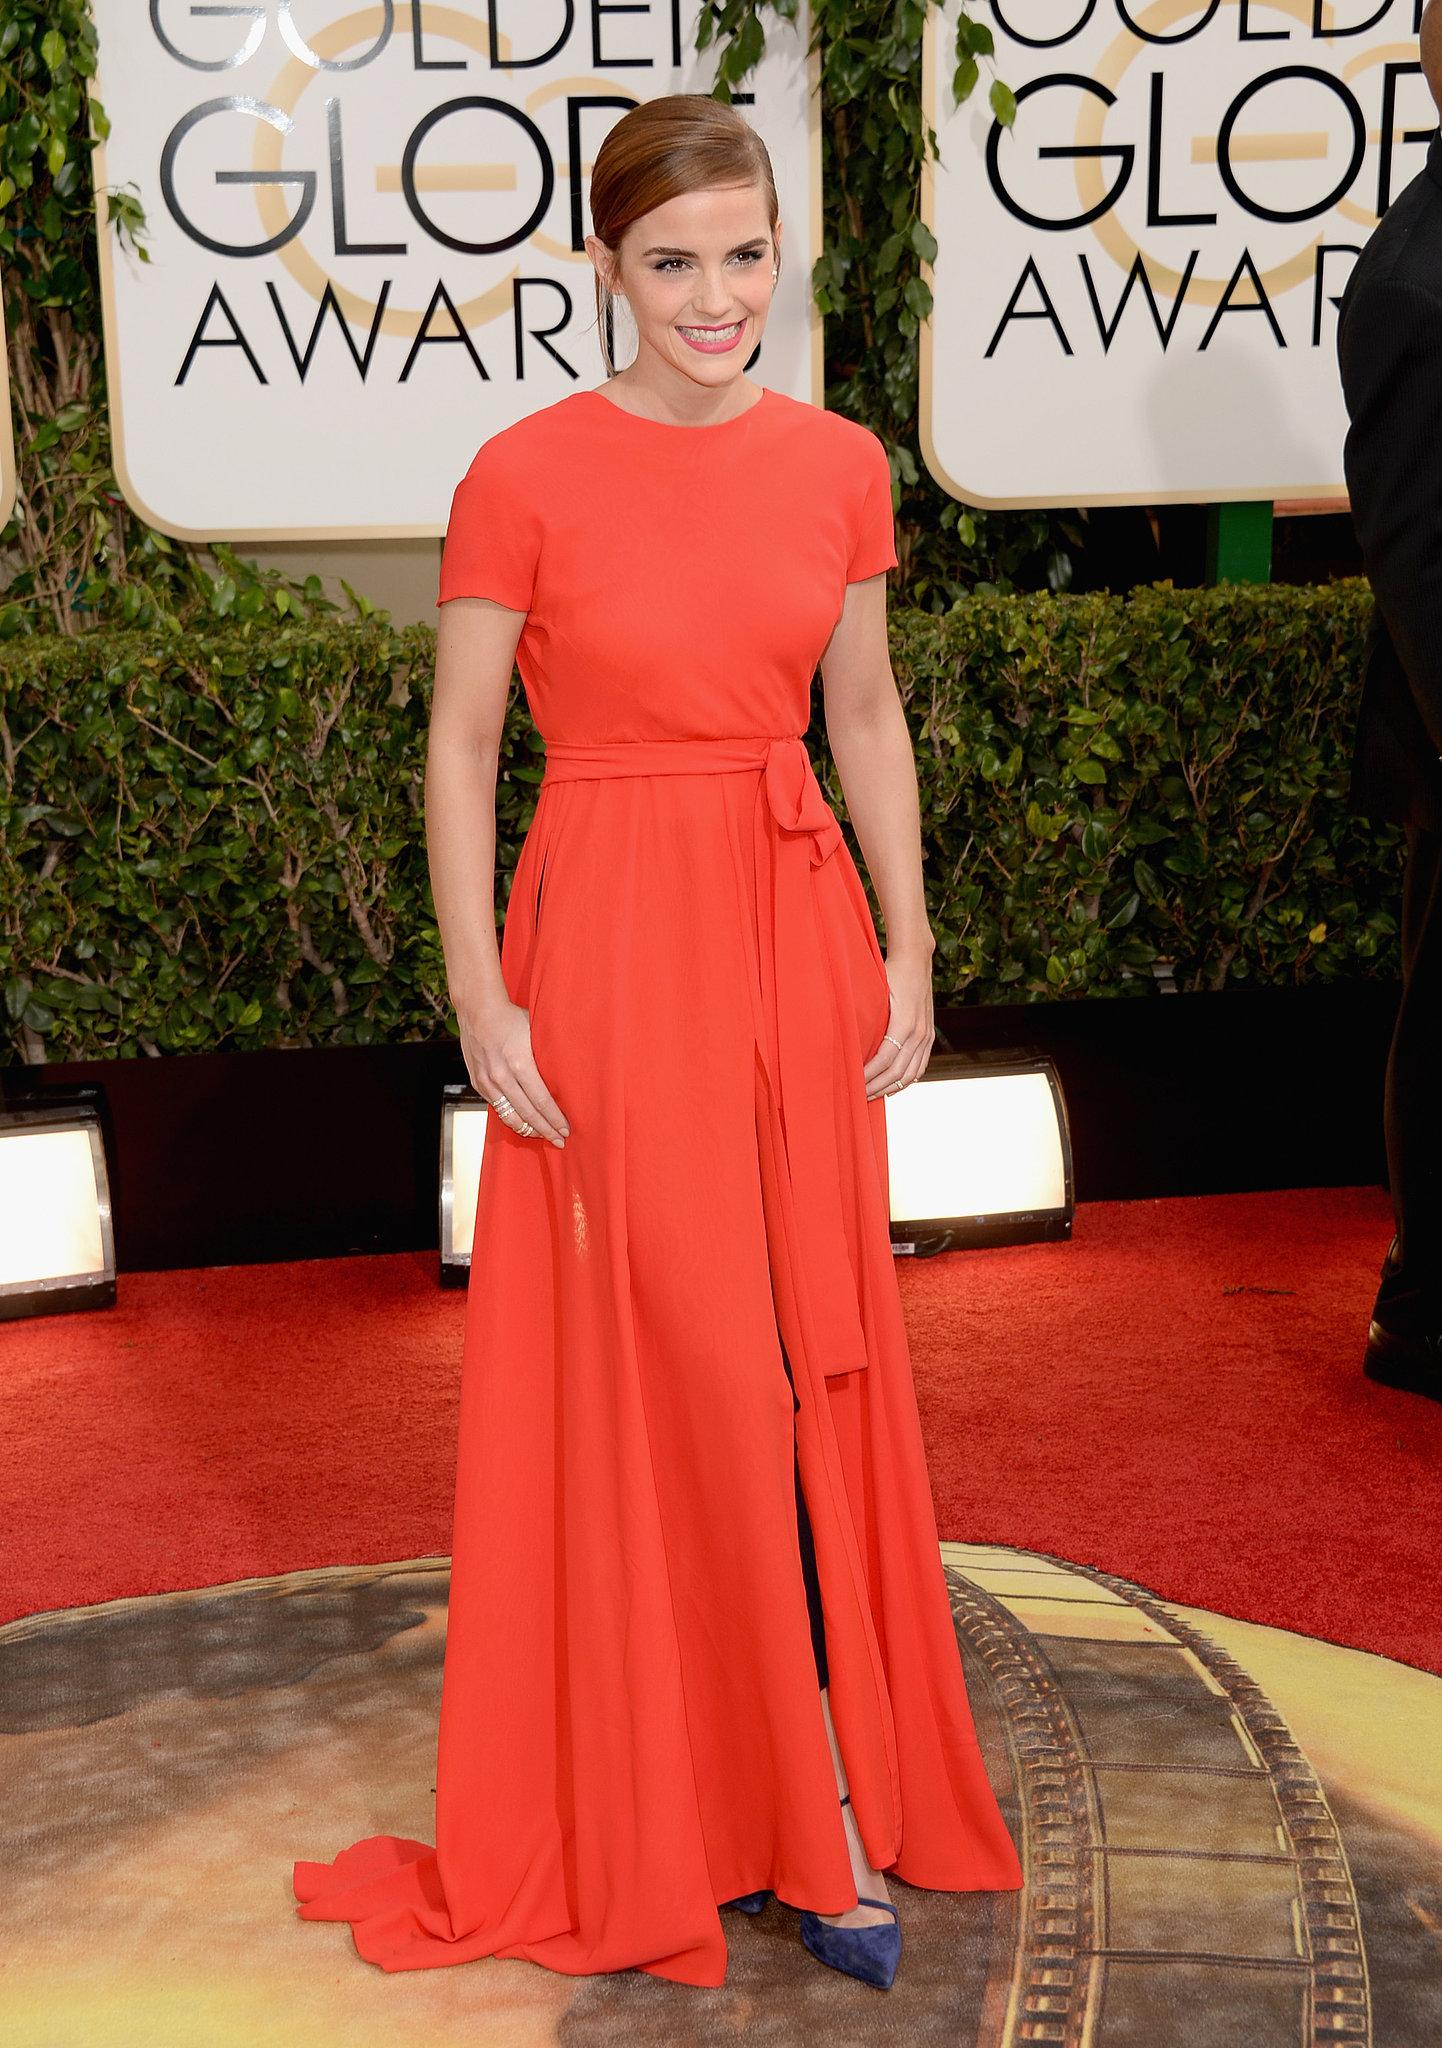 Emma Watson at the Golden Globes 2014